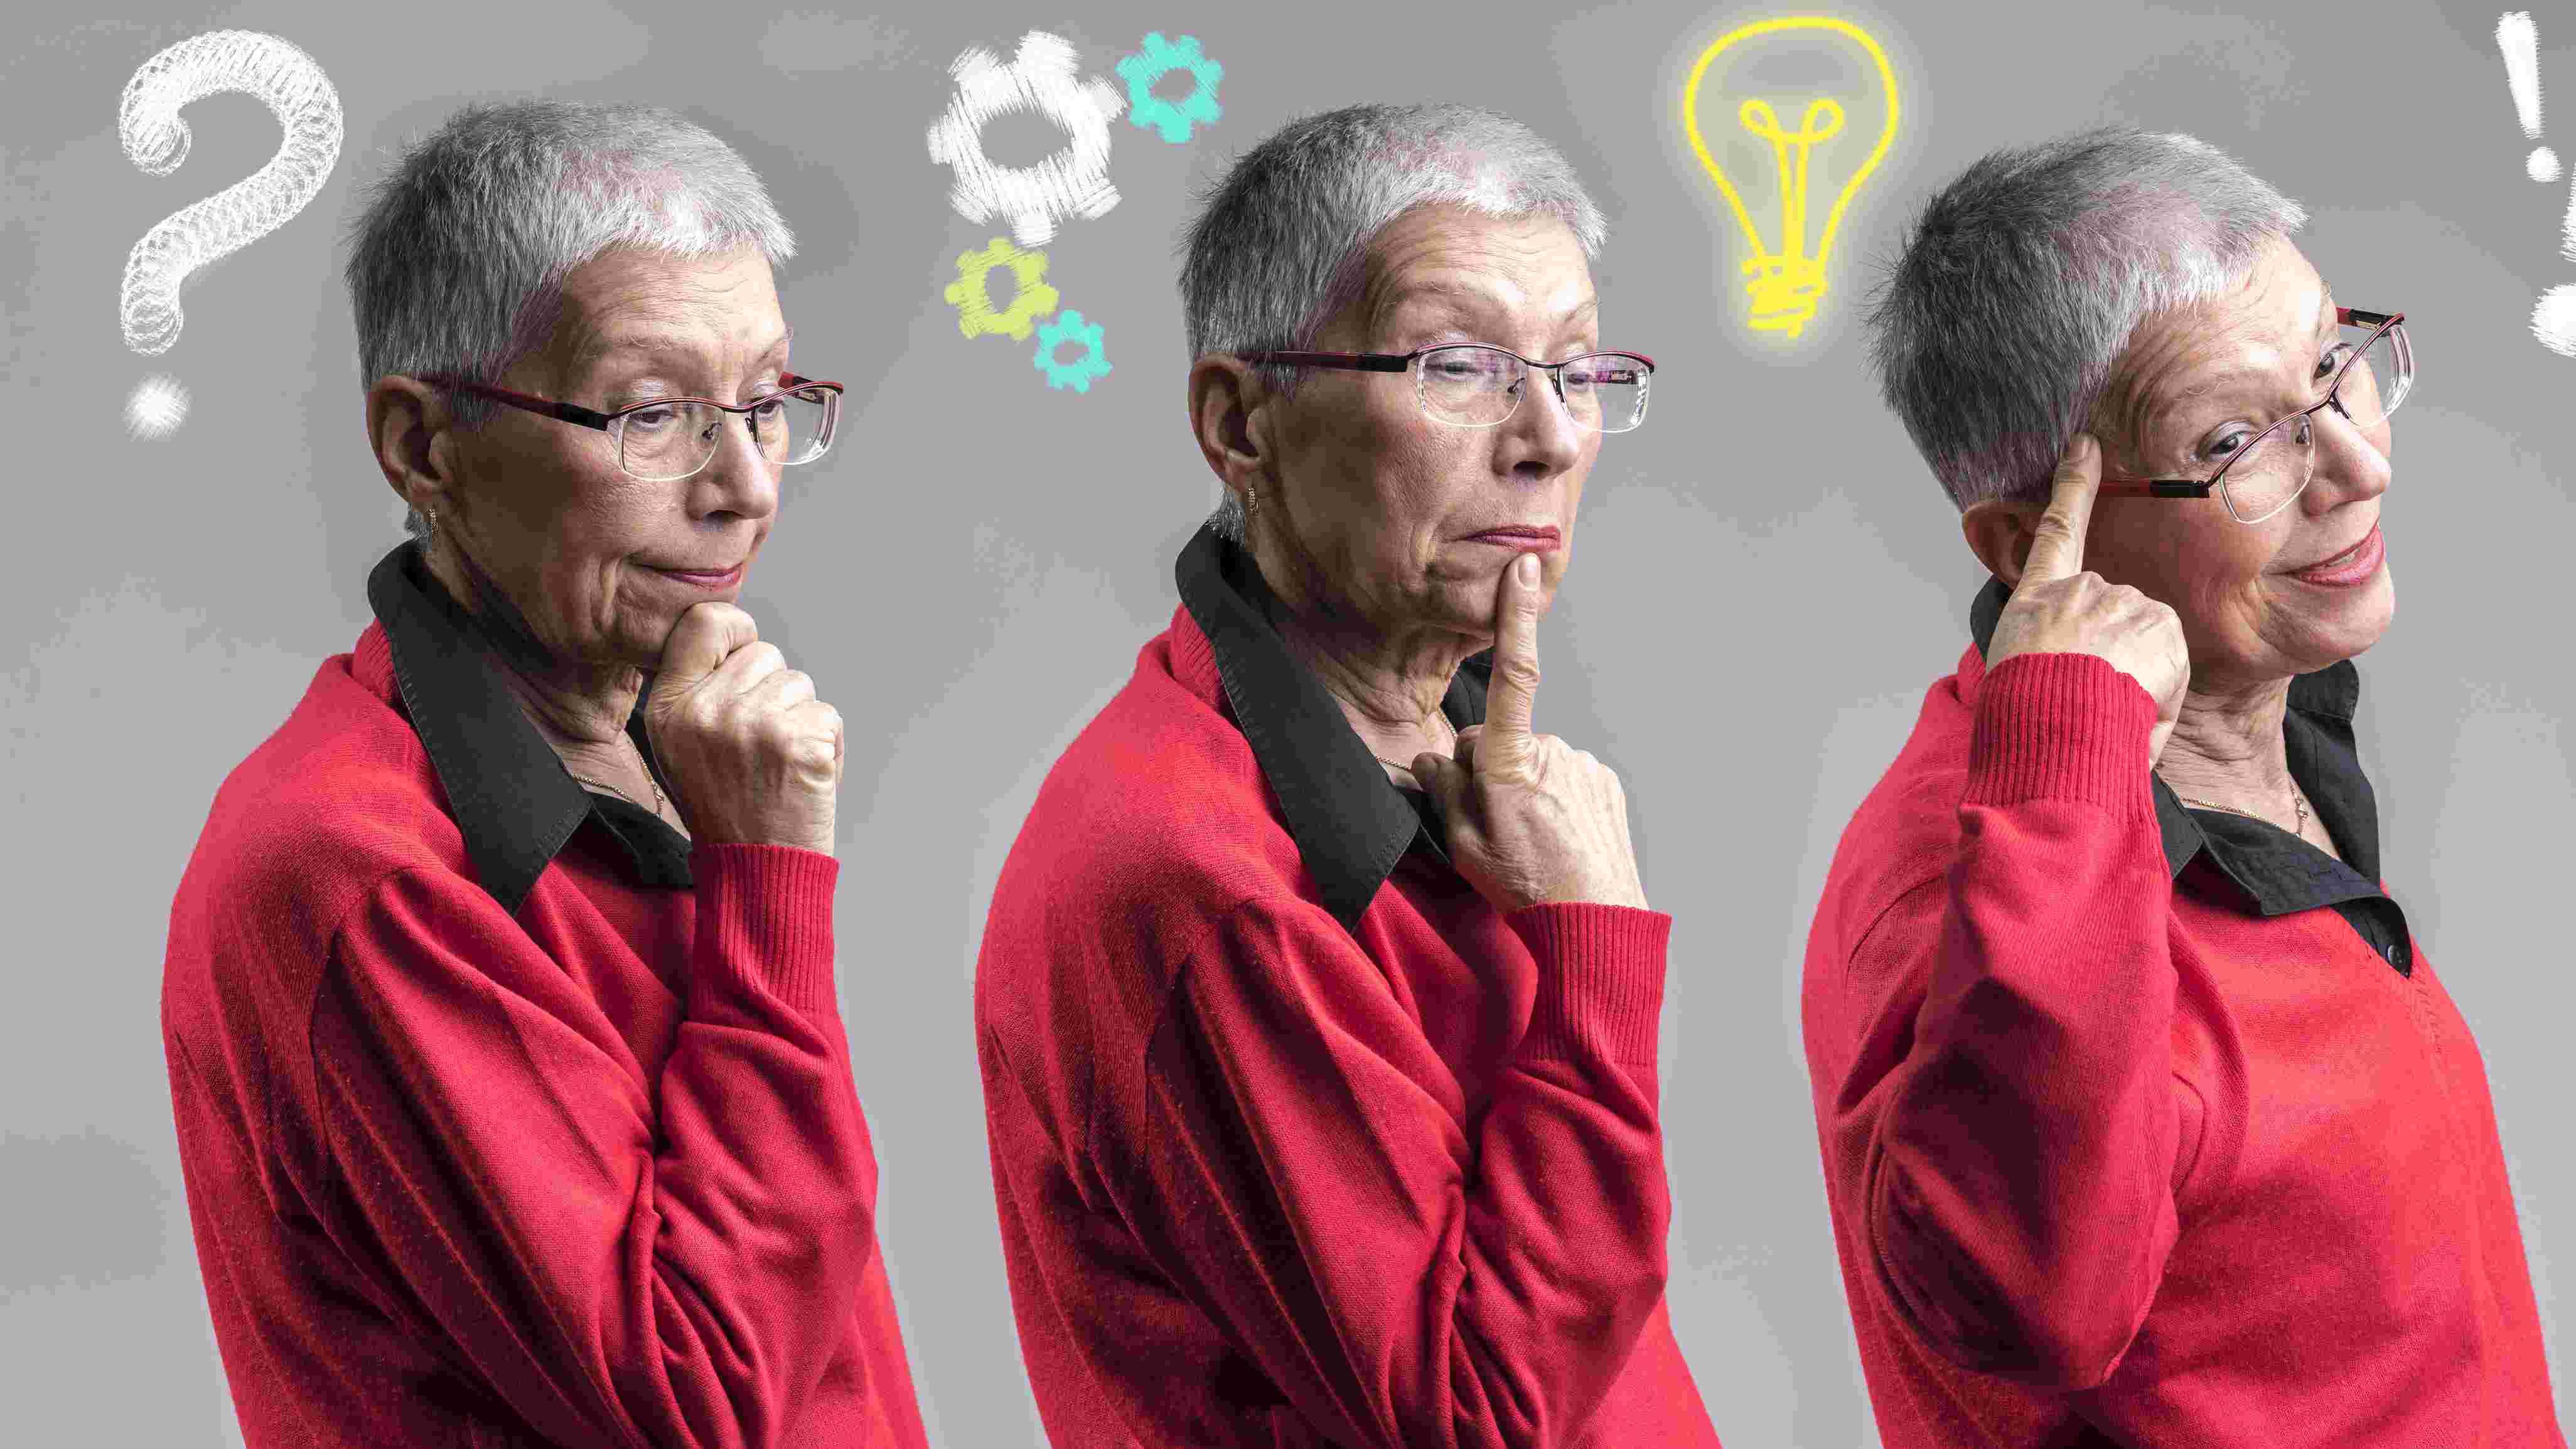 Weird brain exercises that help you get smarter